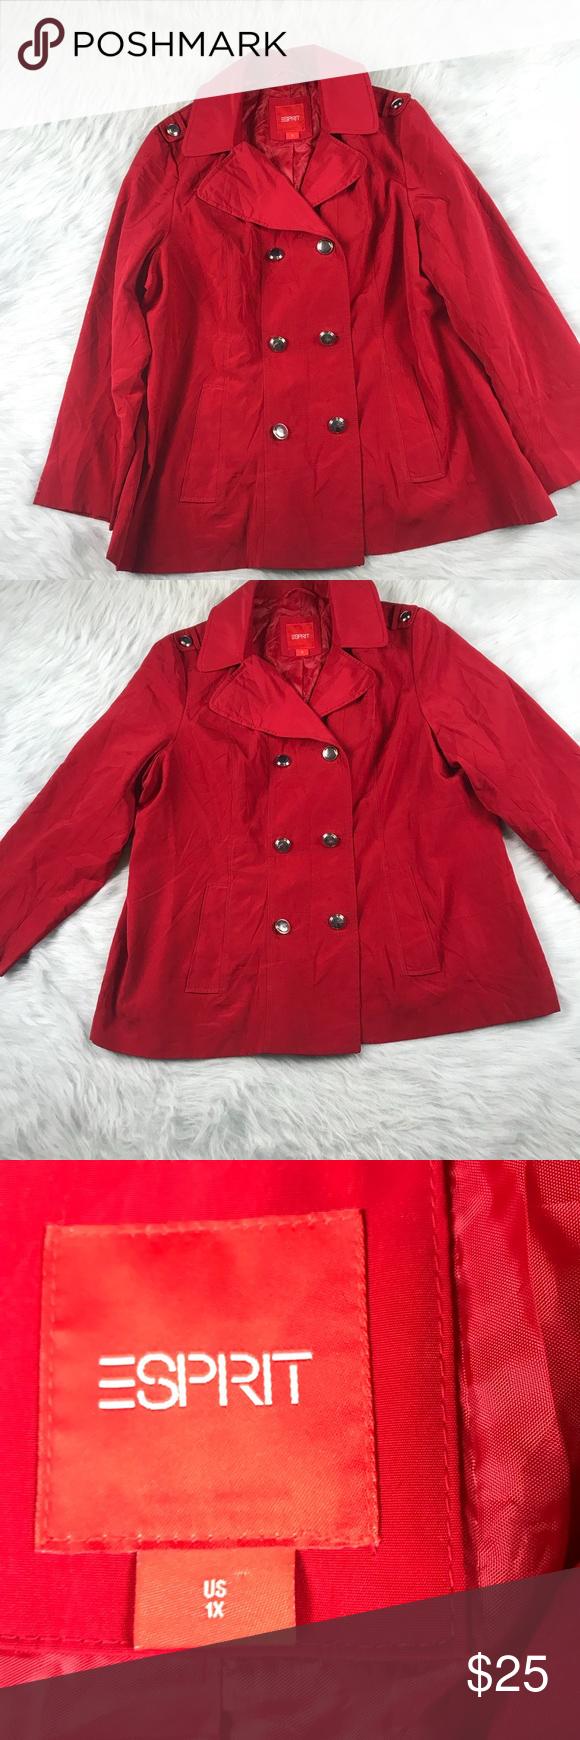 Women S Esprit Red Jacket Size 1x Red Jacket Jackets Clothes Design [ 1740 x 580 Pixel ]